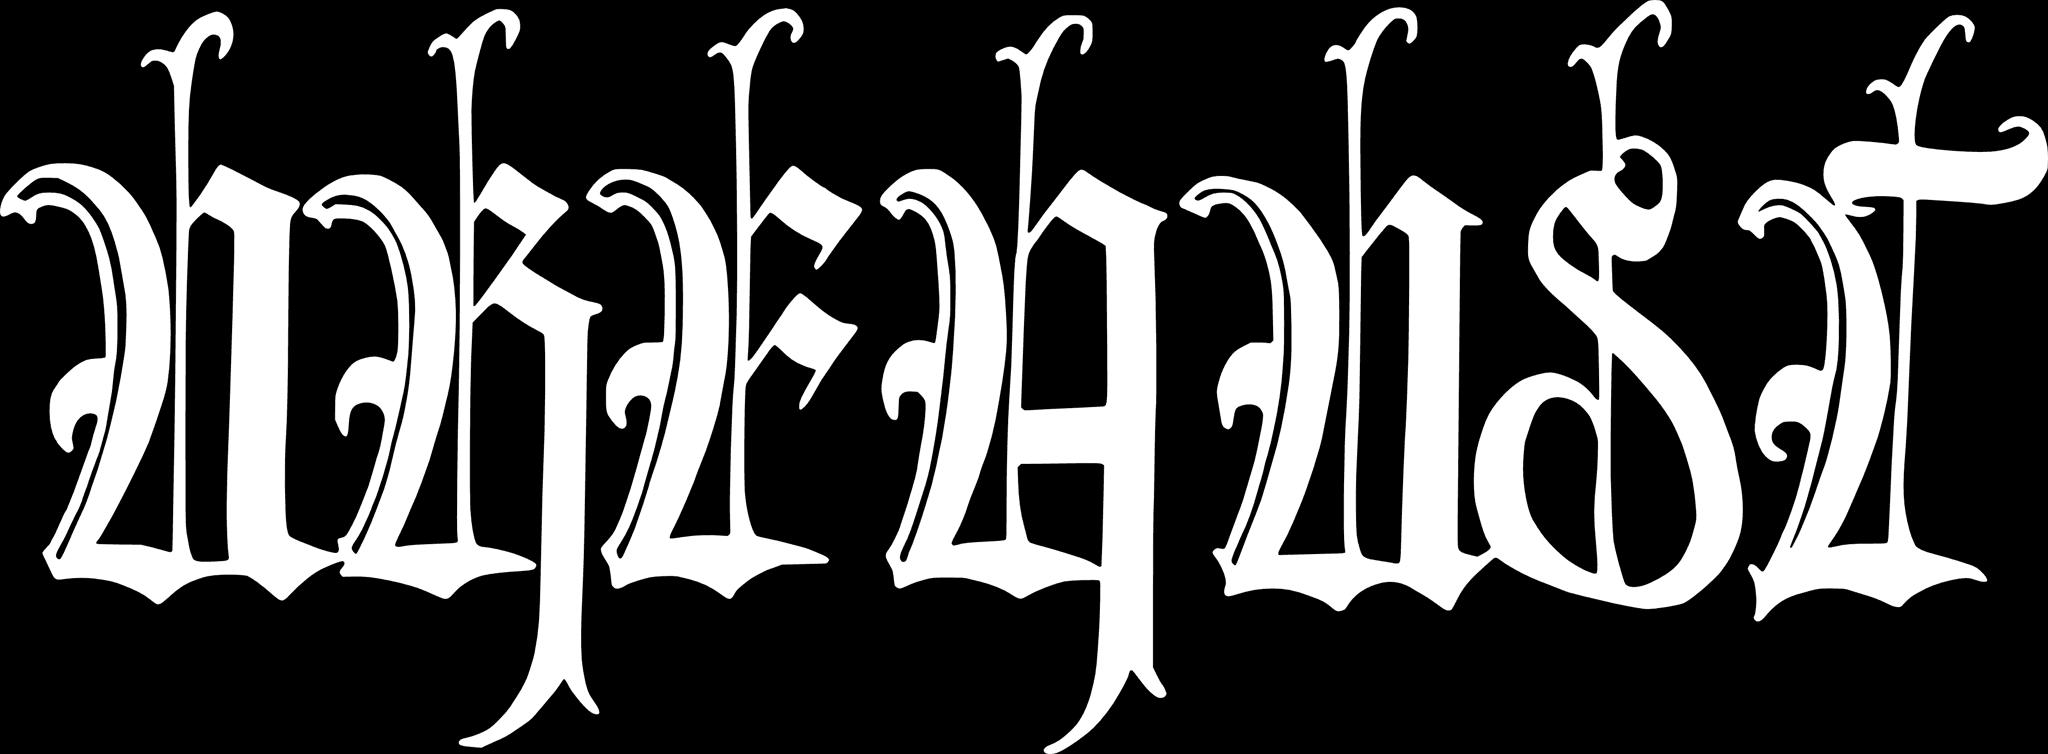 125 - Urfaust -Logo